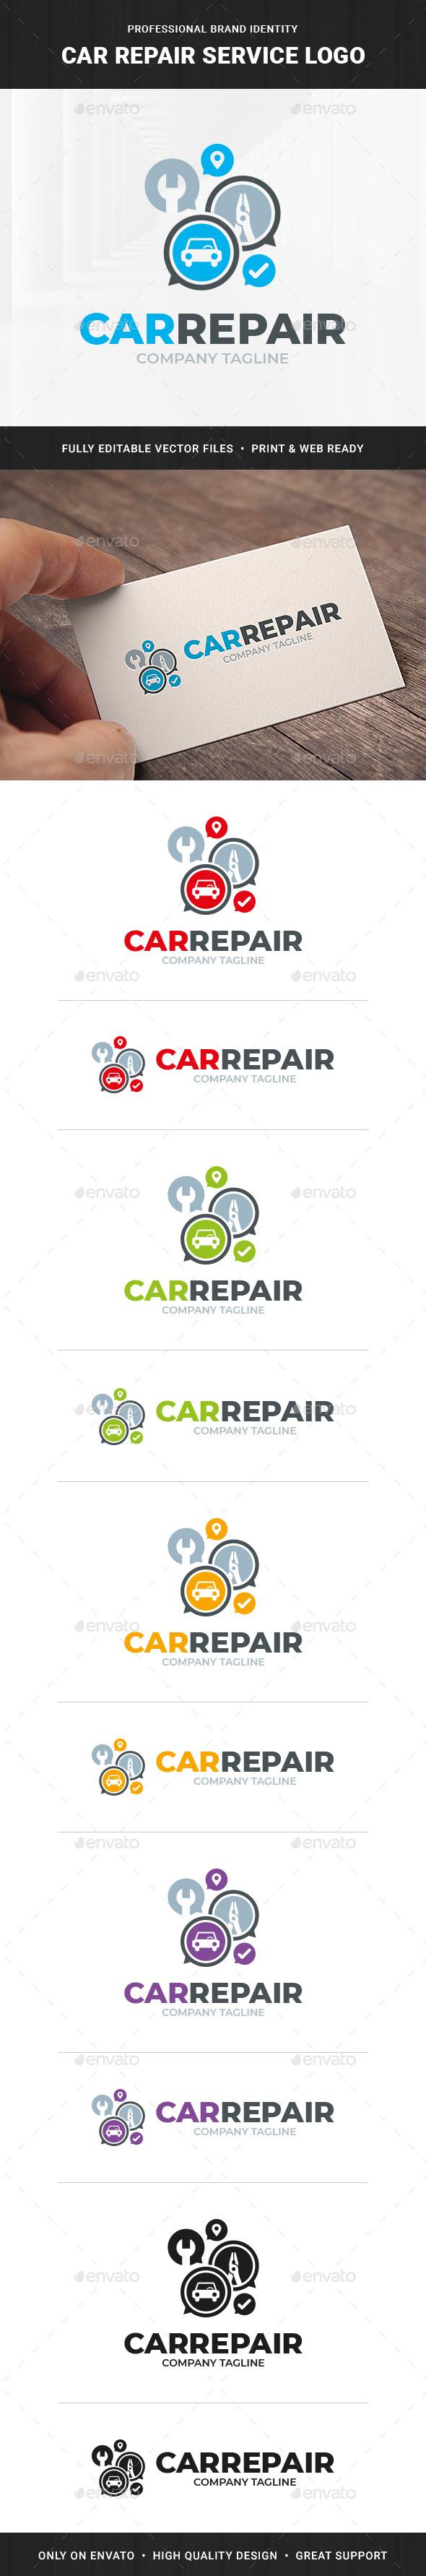 Car Repair Service Logo Template